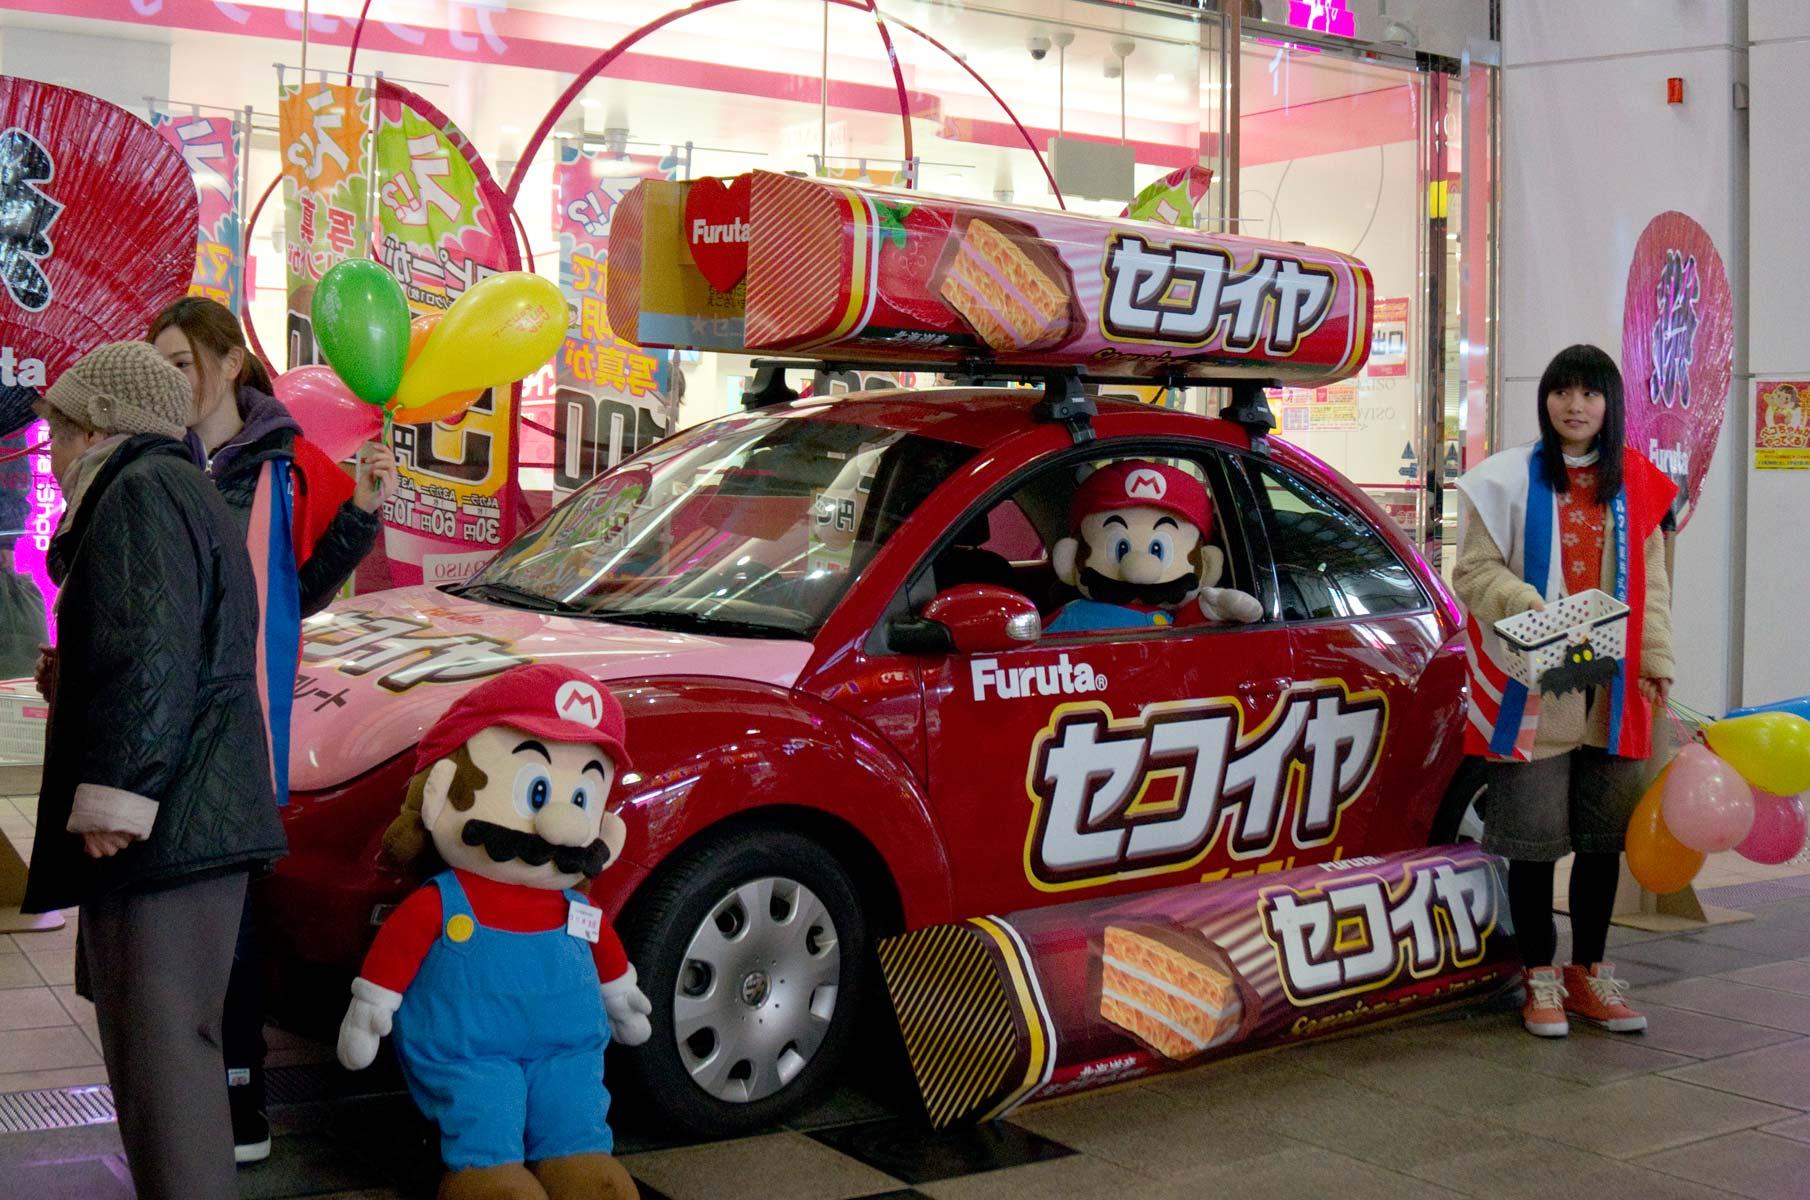 VW Beetle Furuta Werbefahrzeug in Osaka, Japan